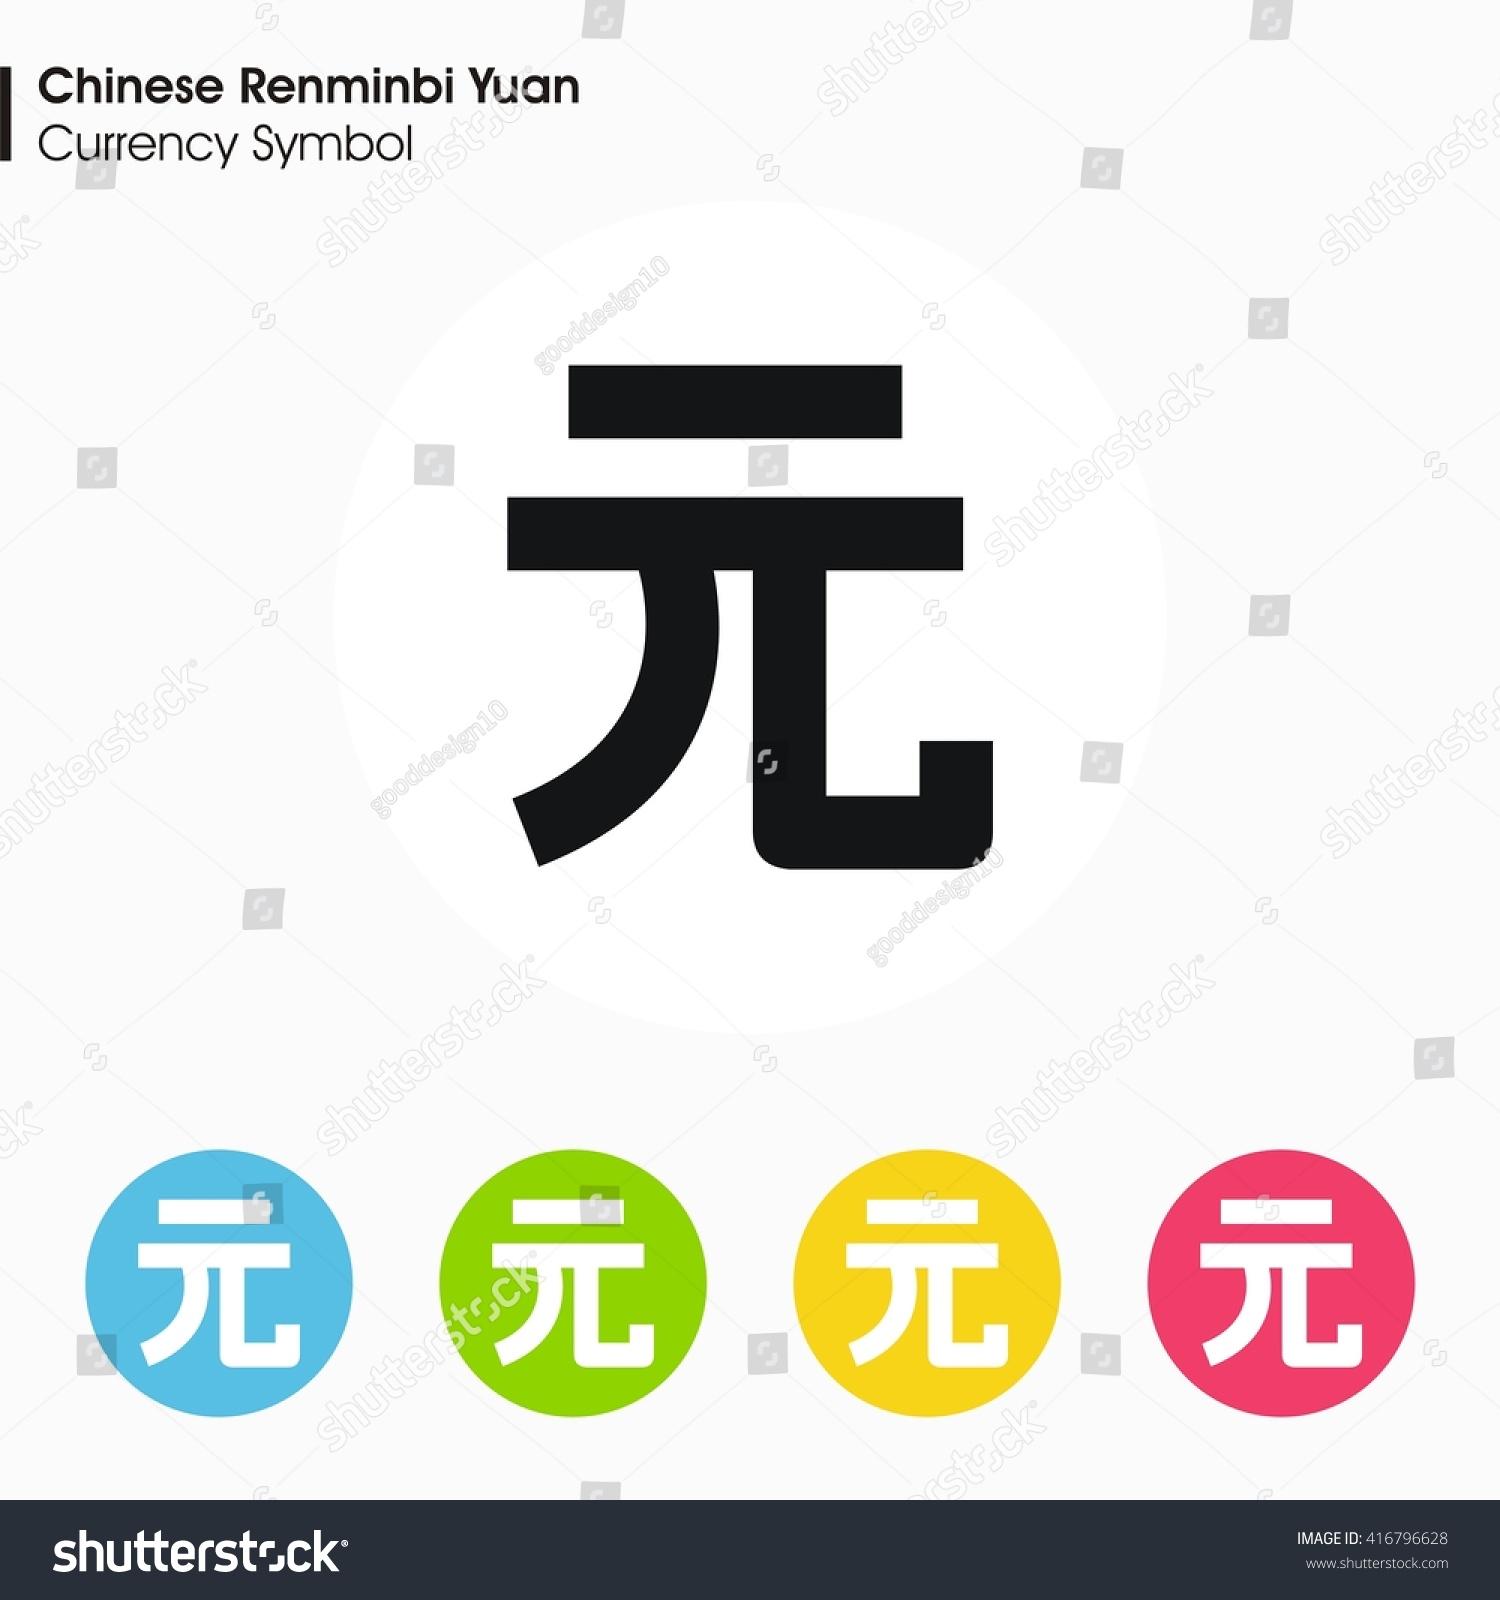 Chinese renminbi yuan sign iconmoney symbol stock vector 416796628 chinese renminbi yuan sign iconney symbol vector illustration biocorpaavc